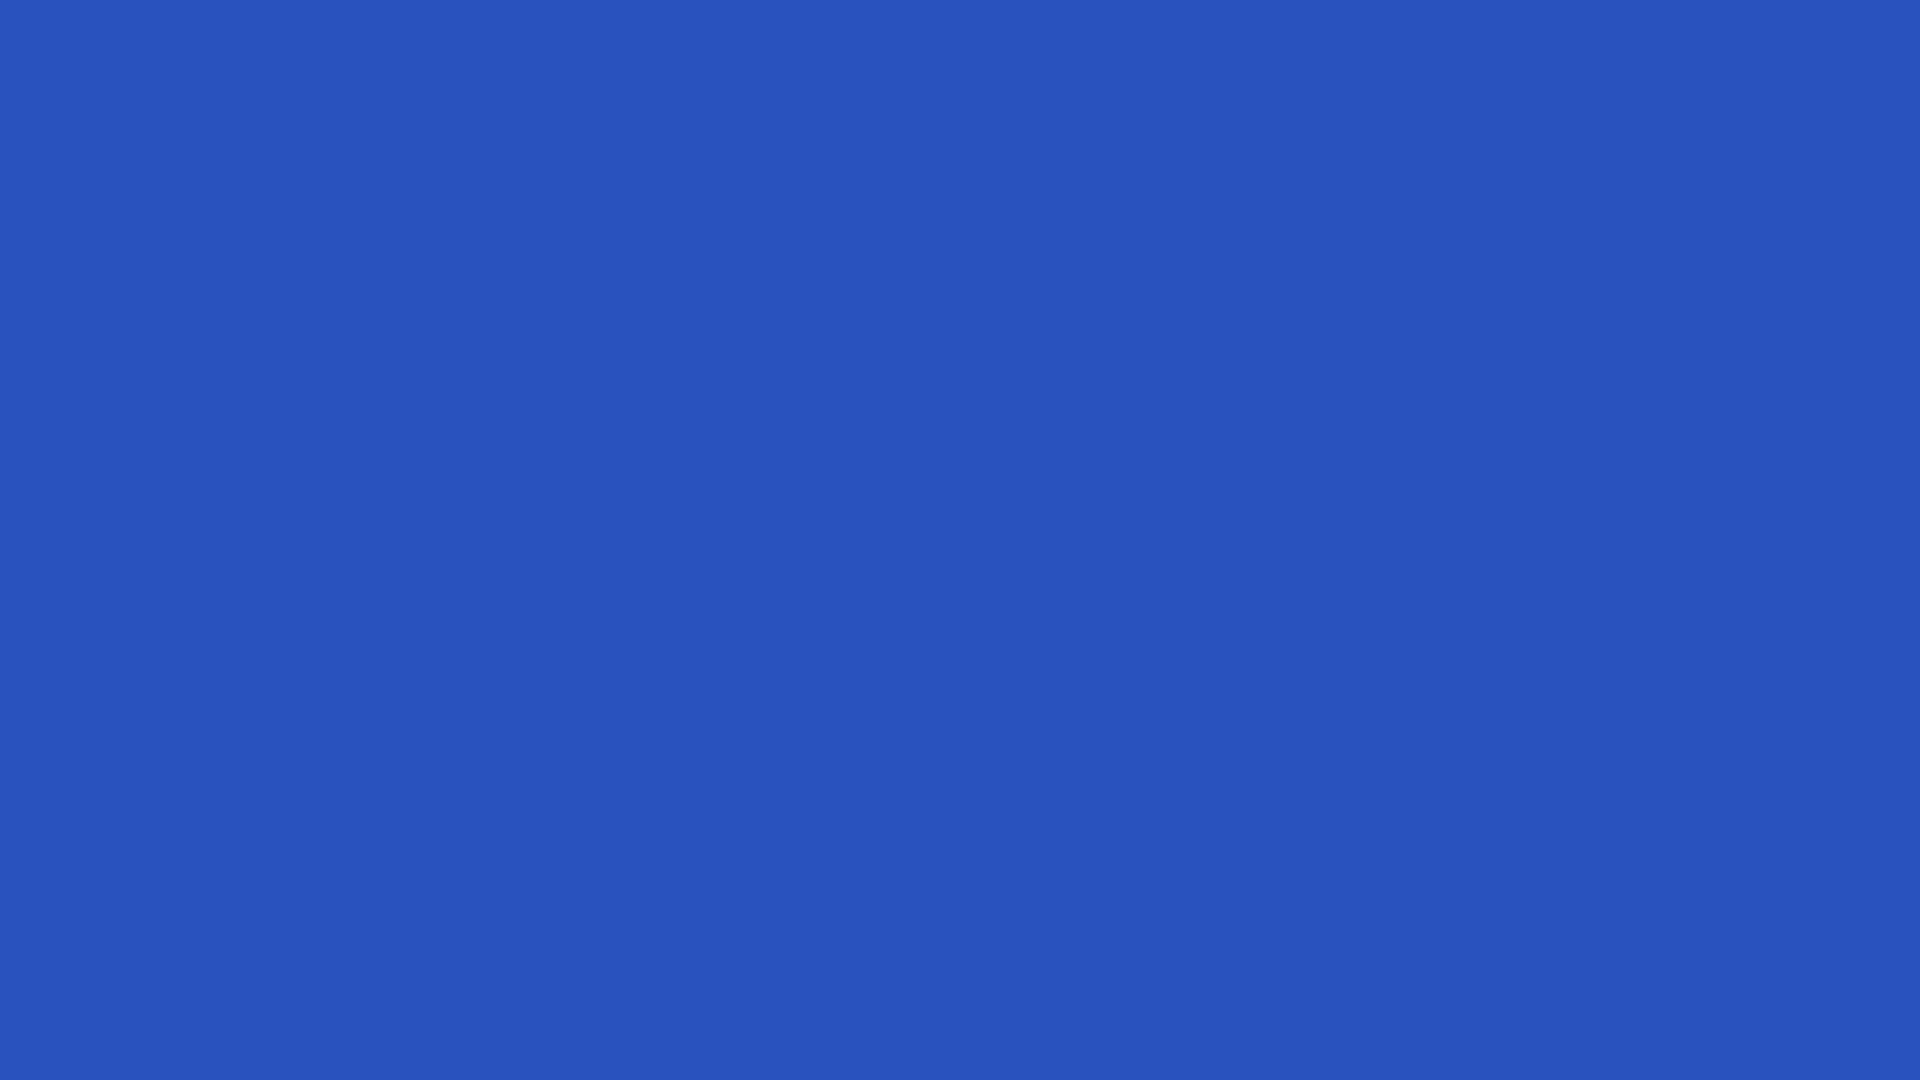 Res: 1920x1080, cerulean blue solid color wallpaper